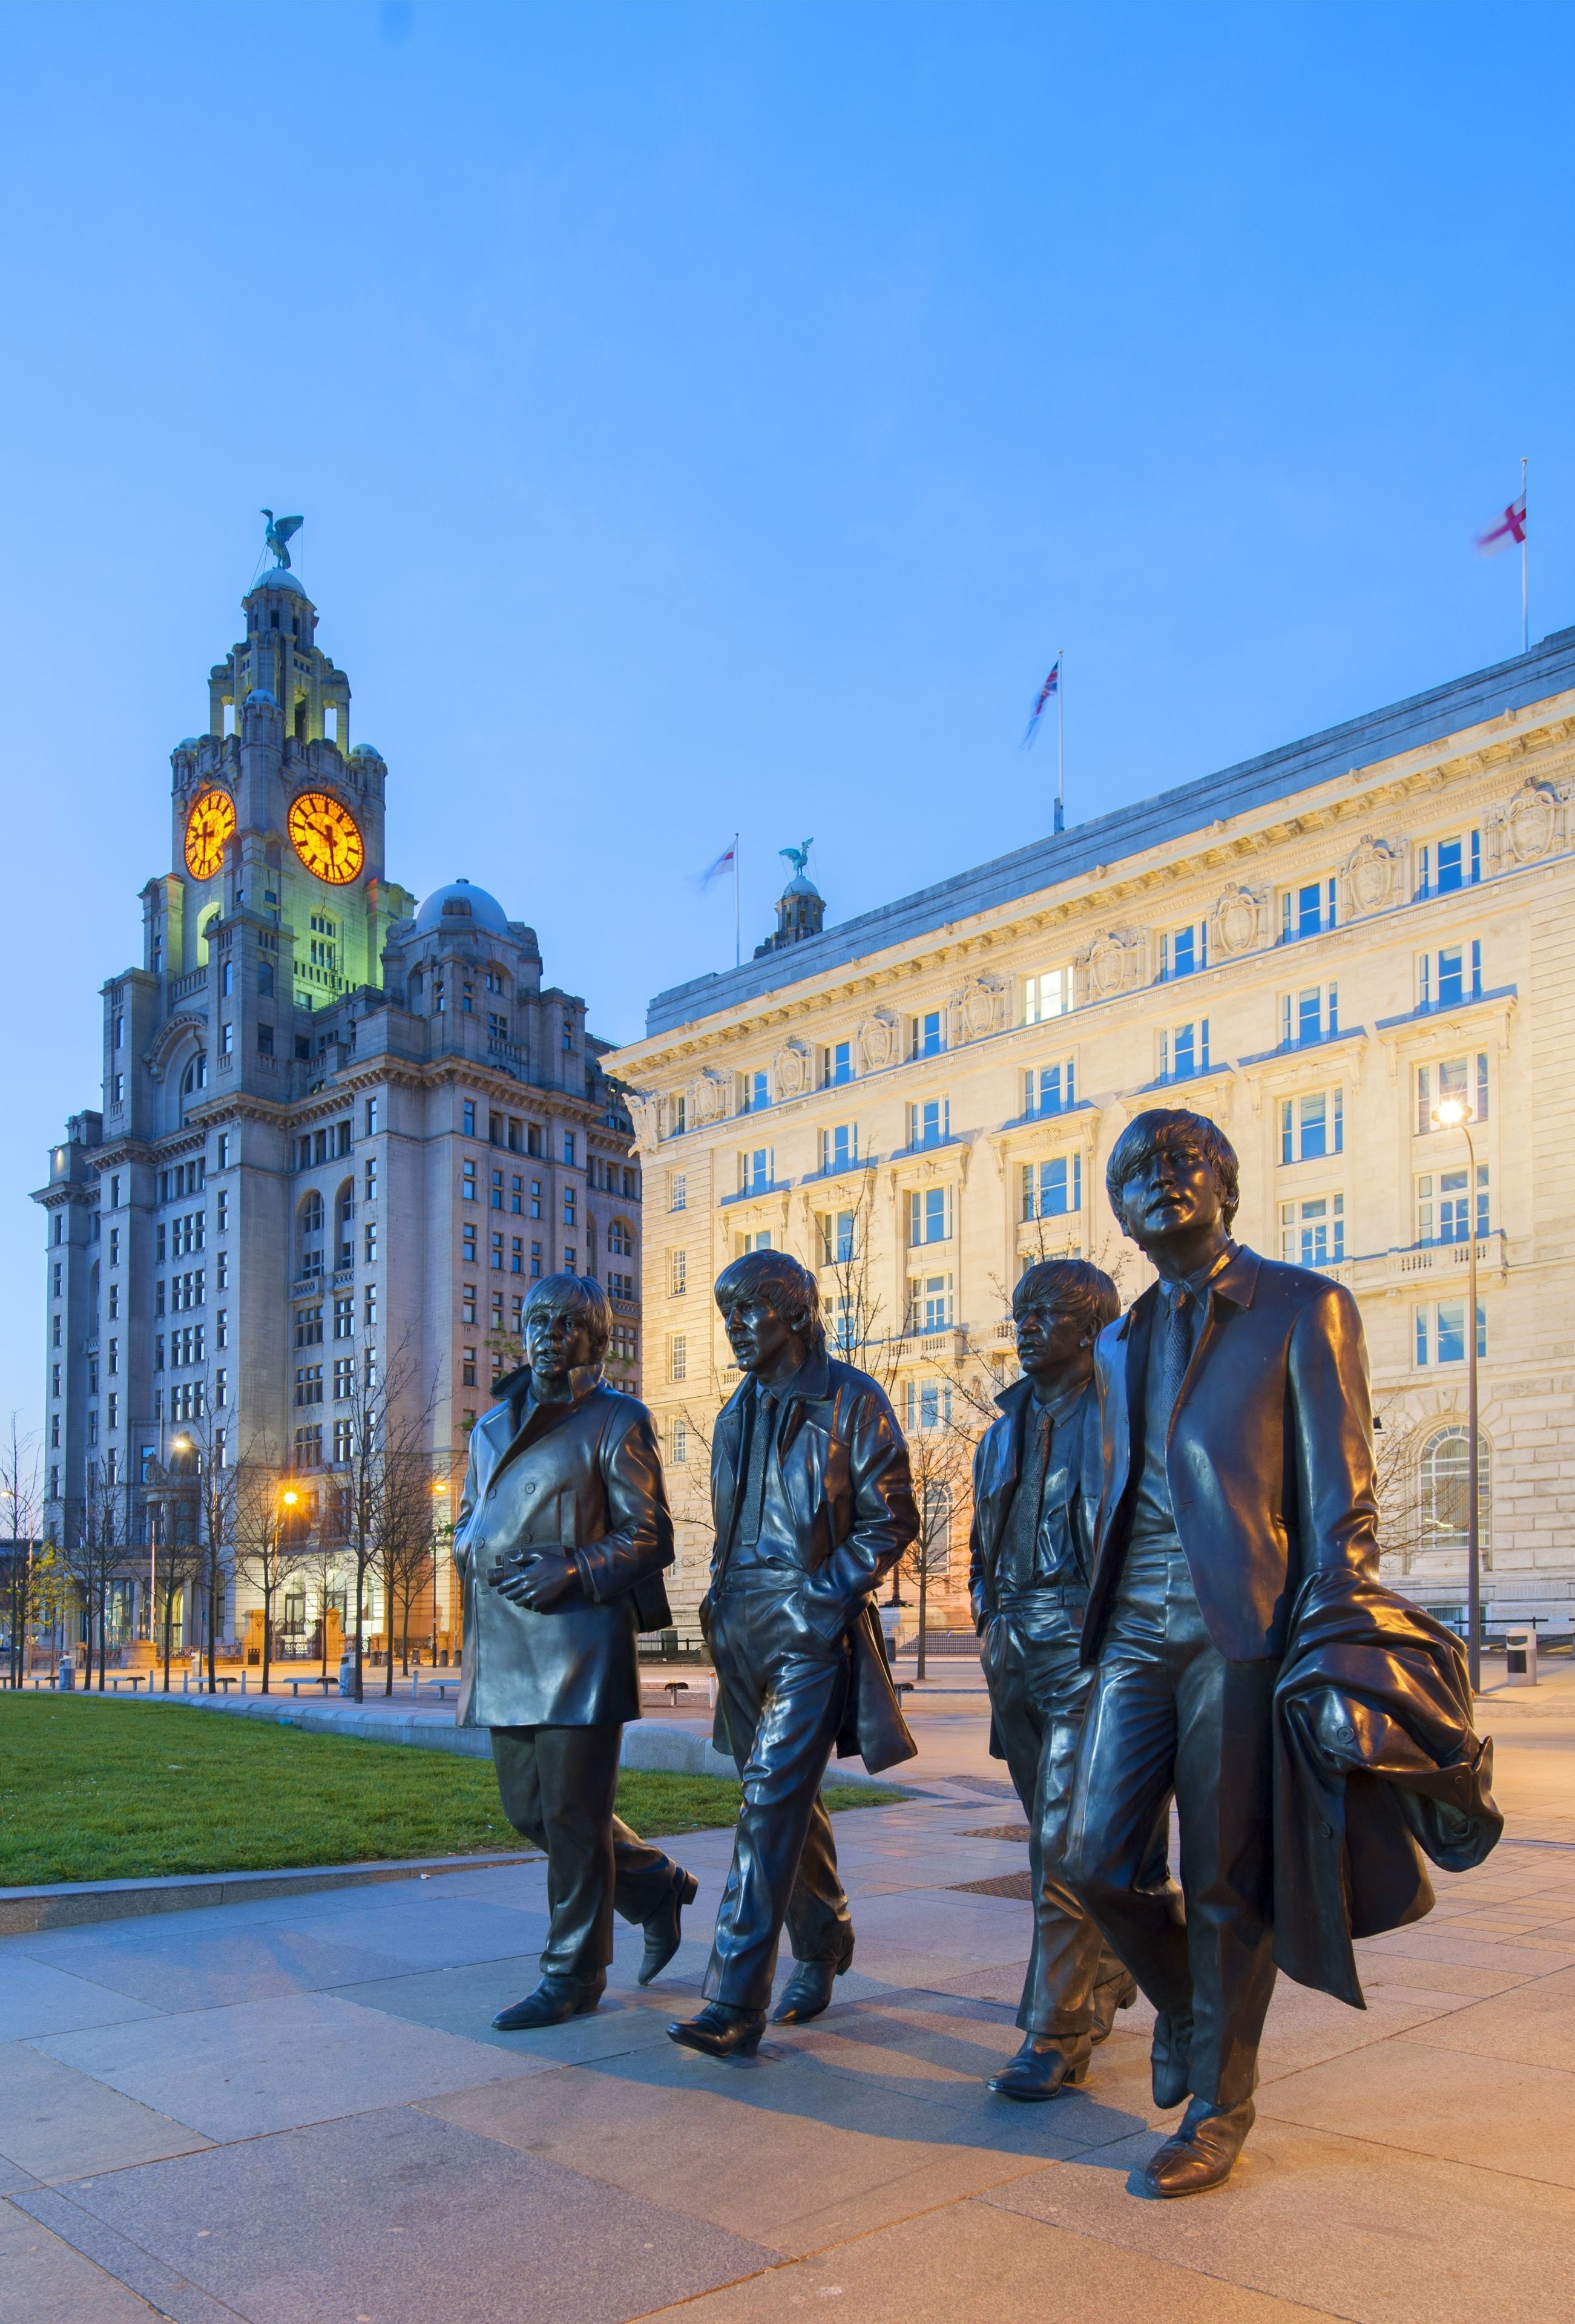 easton_Liverpool_beatles_statue_01.jpg